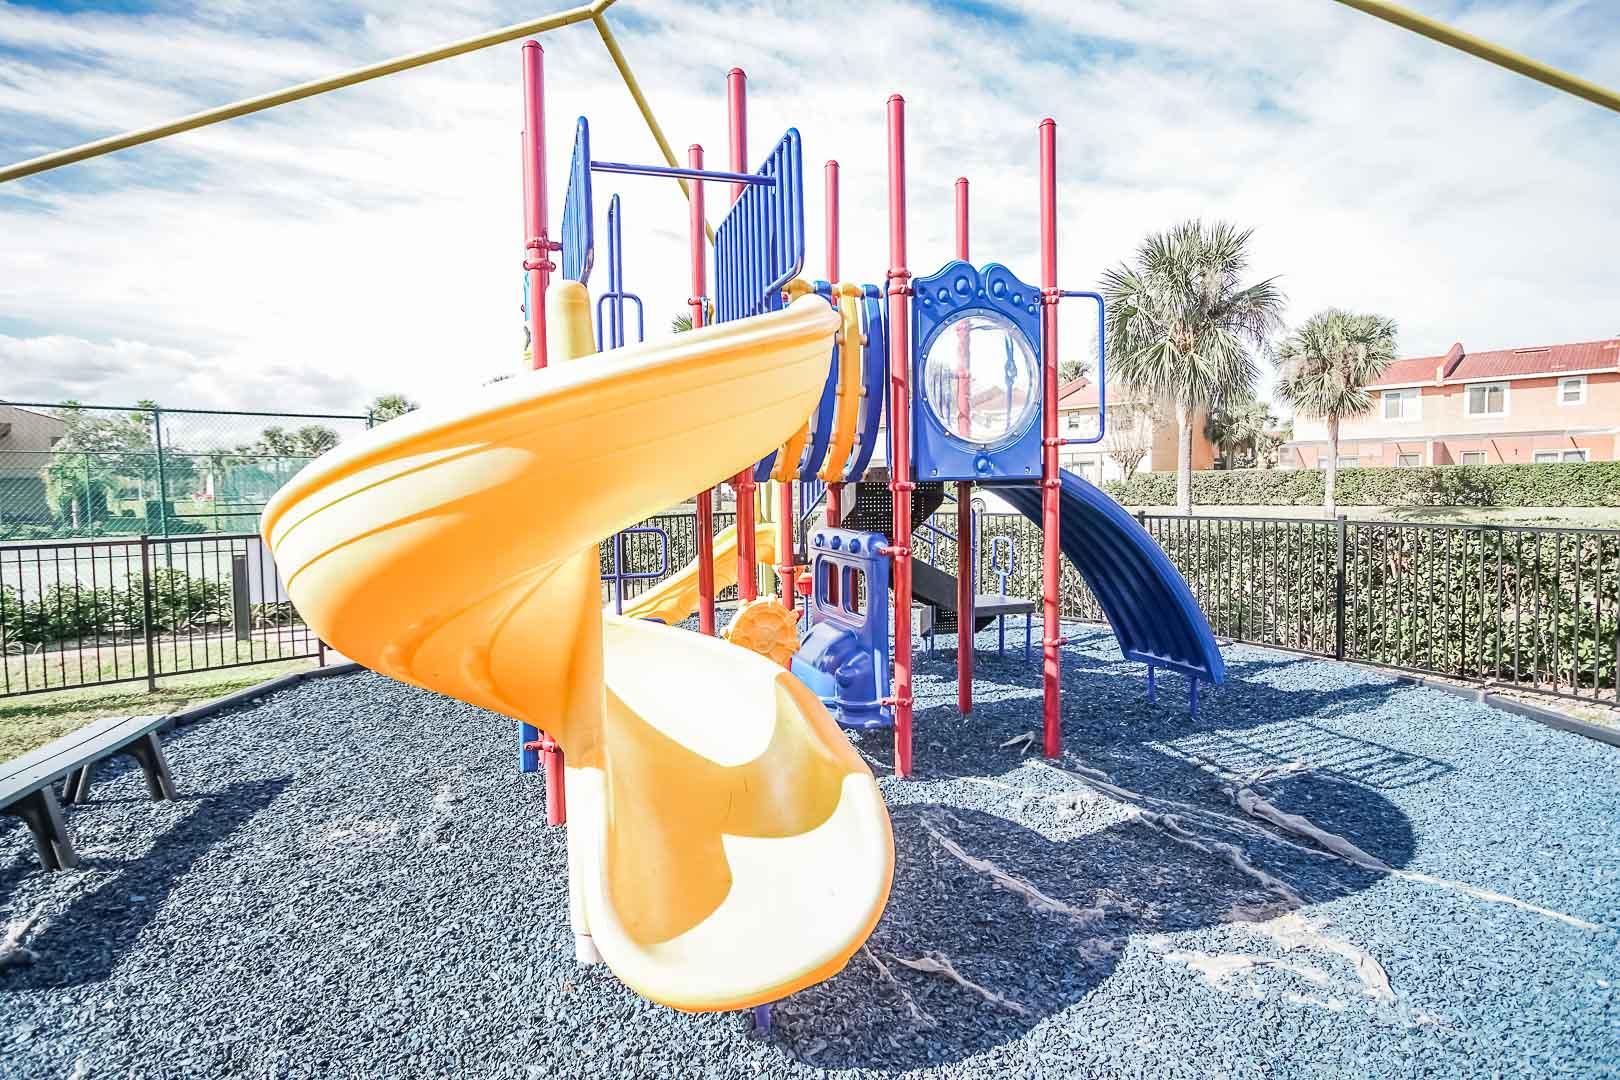 A colorful playground at VRI's Fantasy World Resort in Florida.